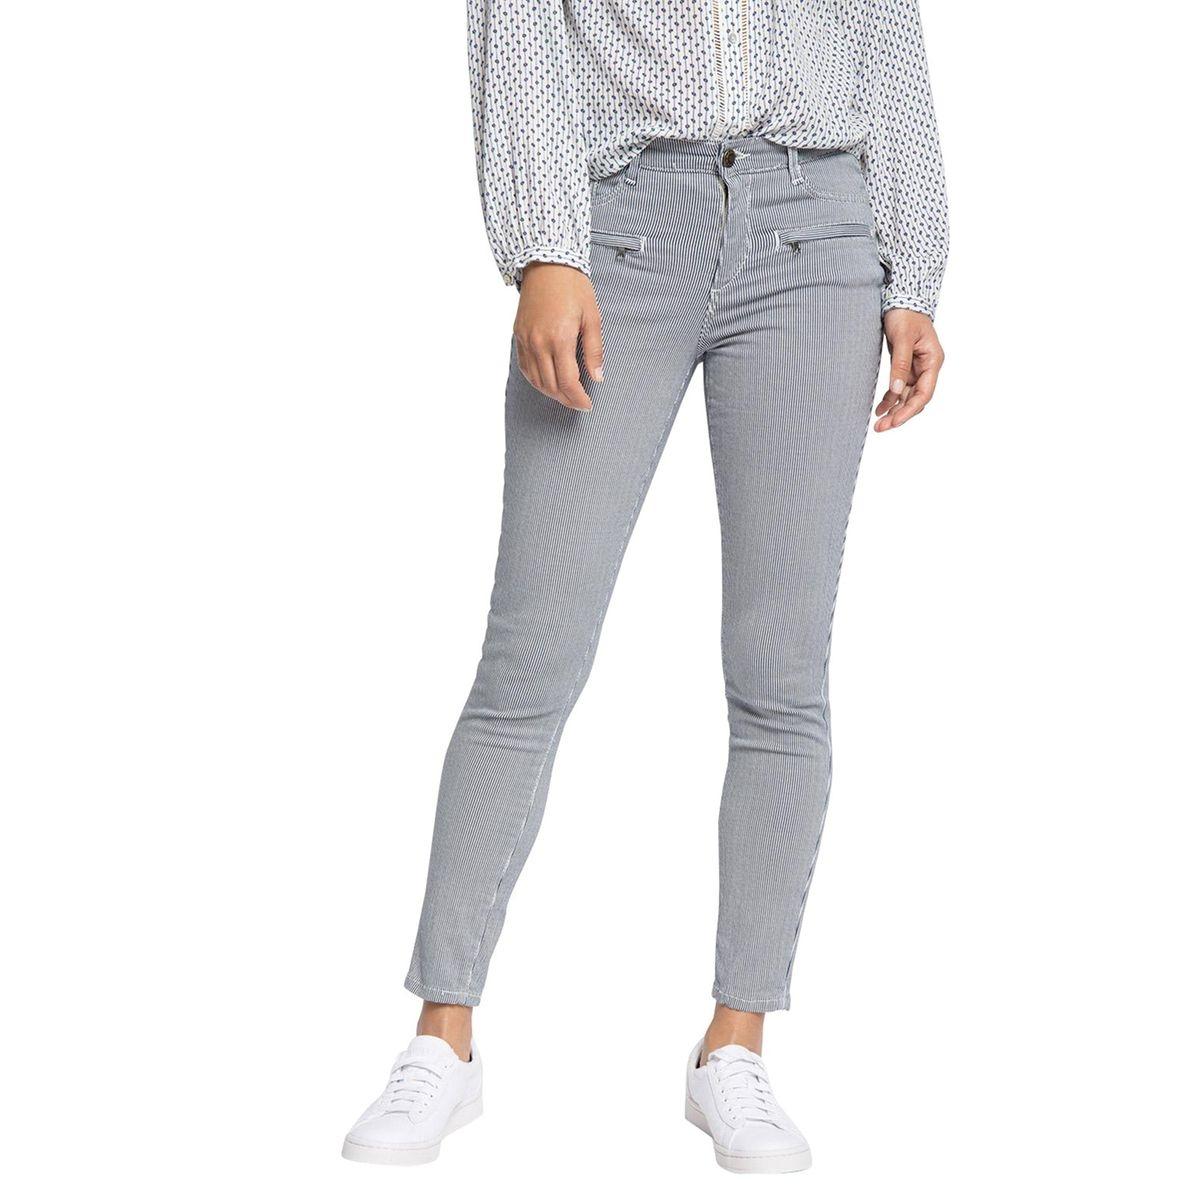 Pantalon rayé 5 poches, longueur 28